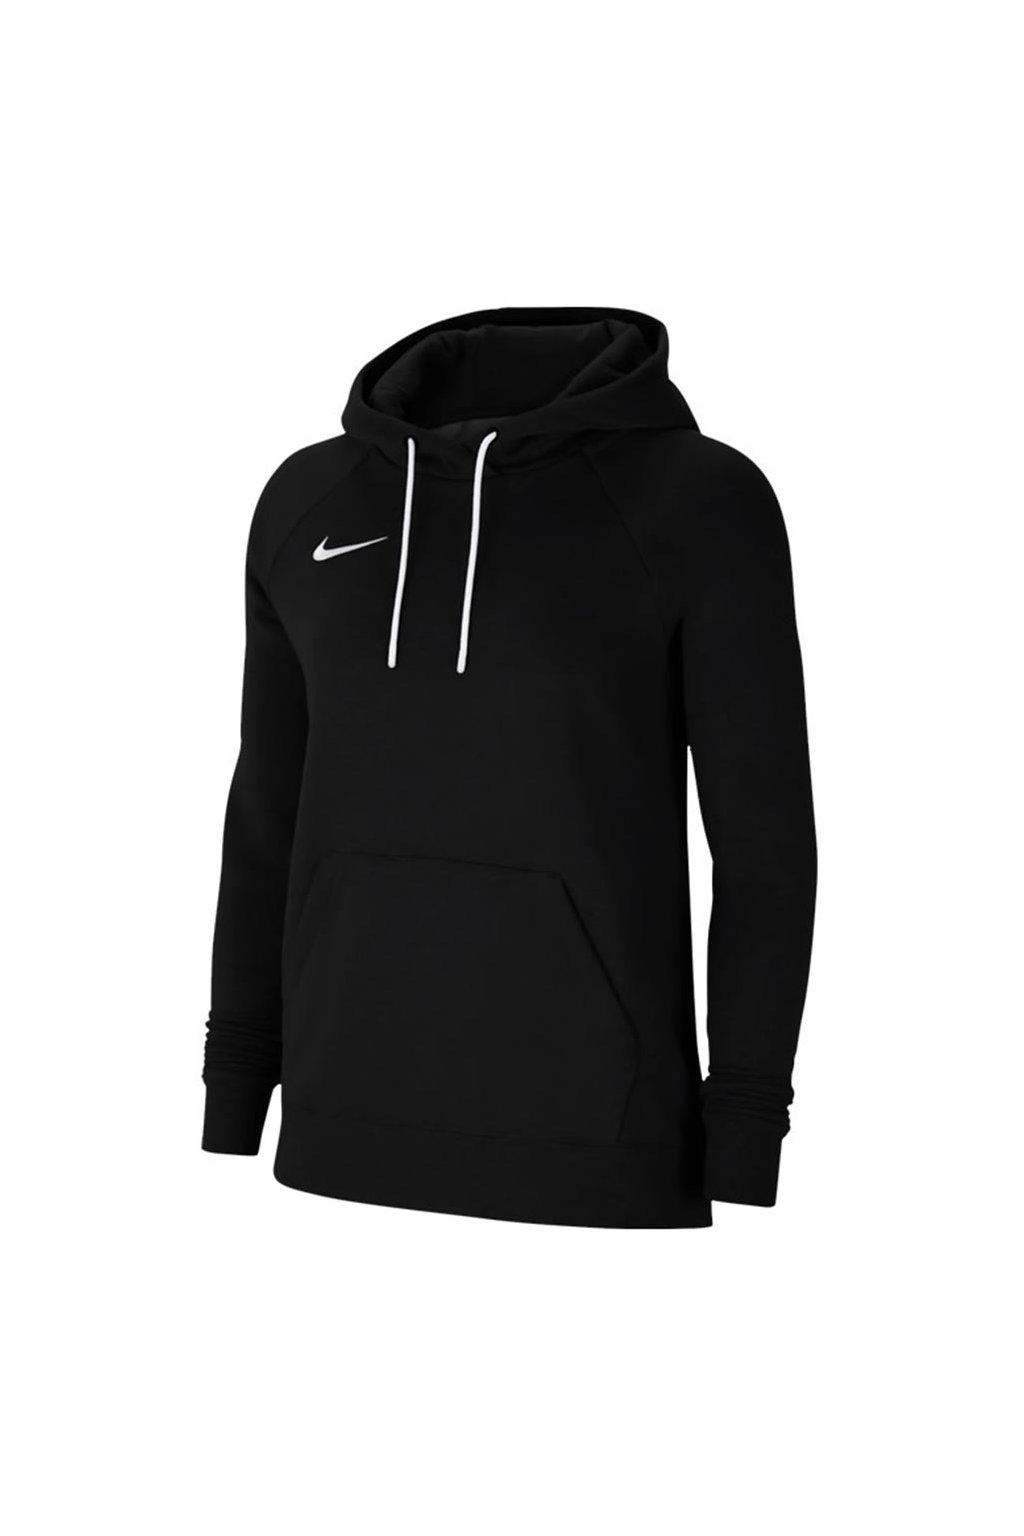 Dámska mikina Nike Team Club 20 Hoodie čierna CW6957 010